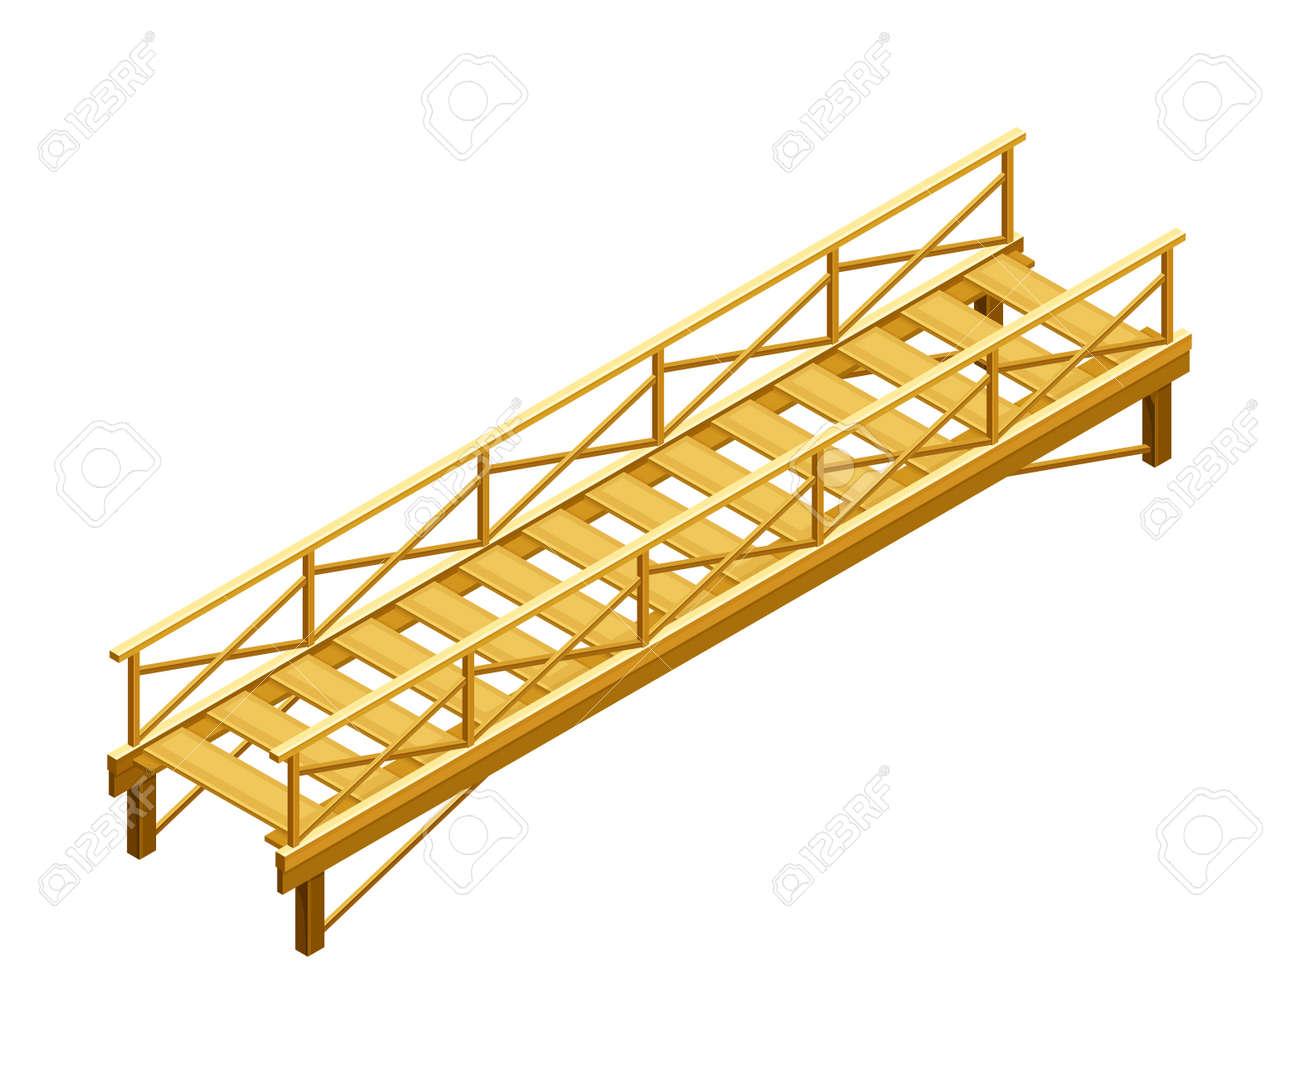 Straight Wooden Bridge with Balustrade Railing Vector Illustration - 167912217